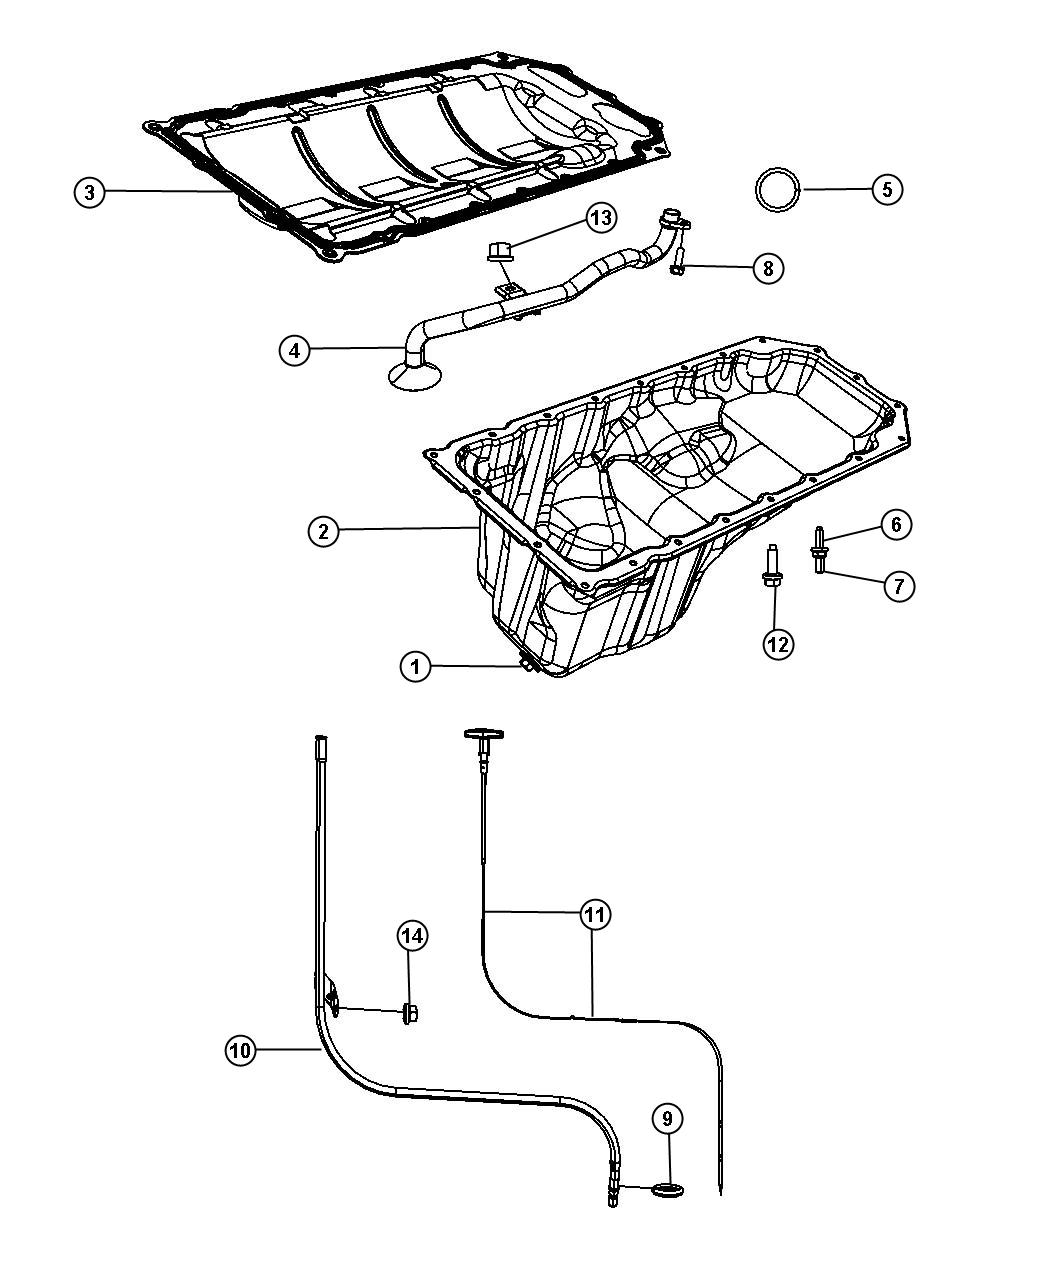 Dodge Ram Stud M6x1 00x36 97 Mounting Oil Pan